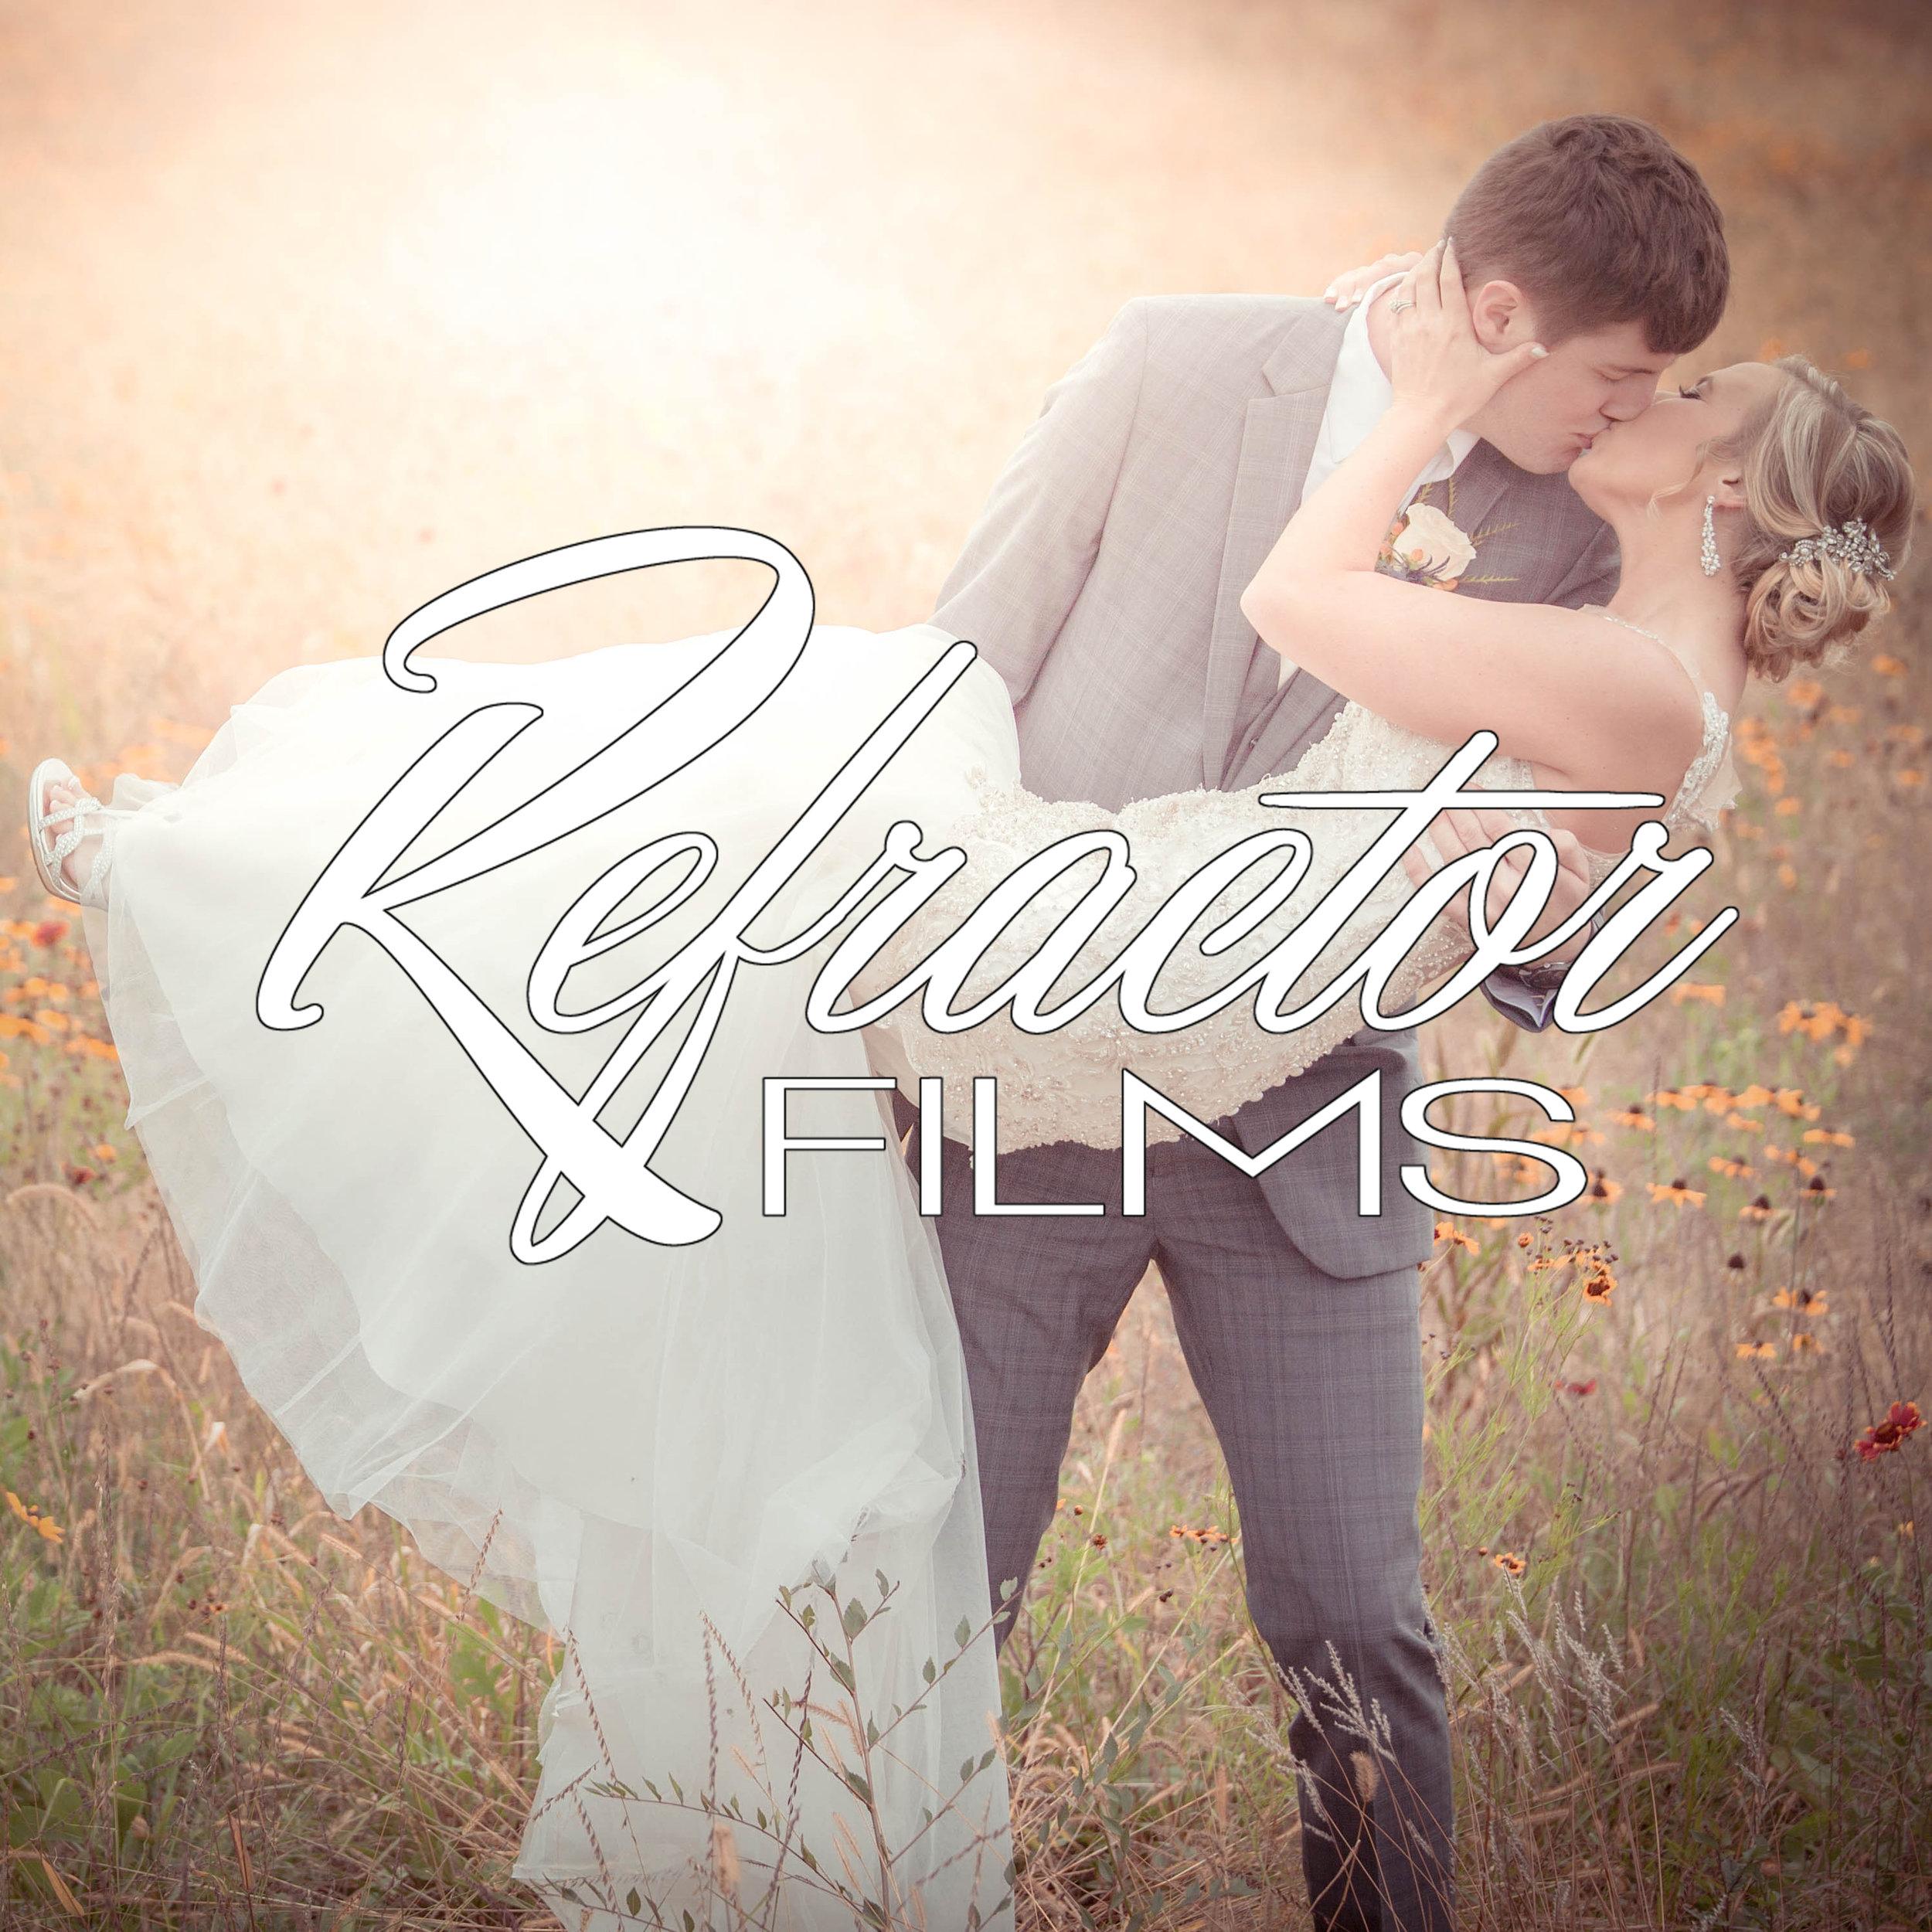 Uptown Website Logo - Refractor Films.jpg